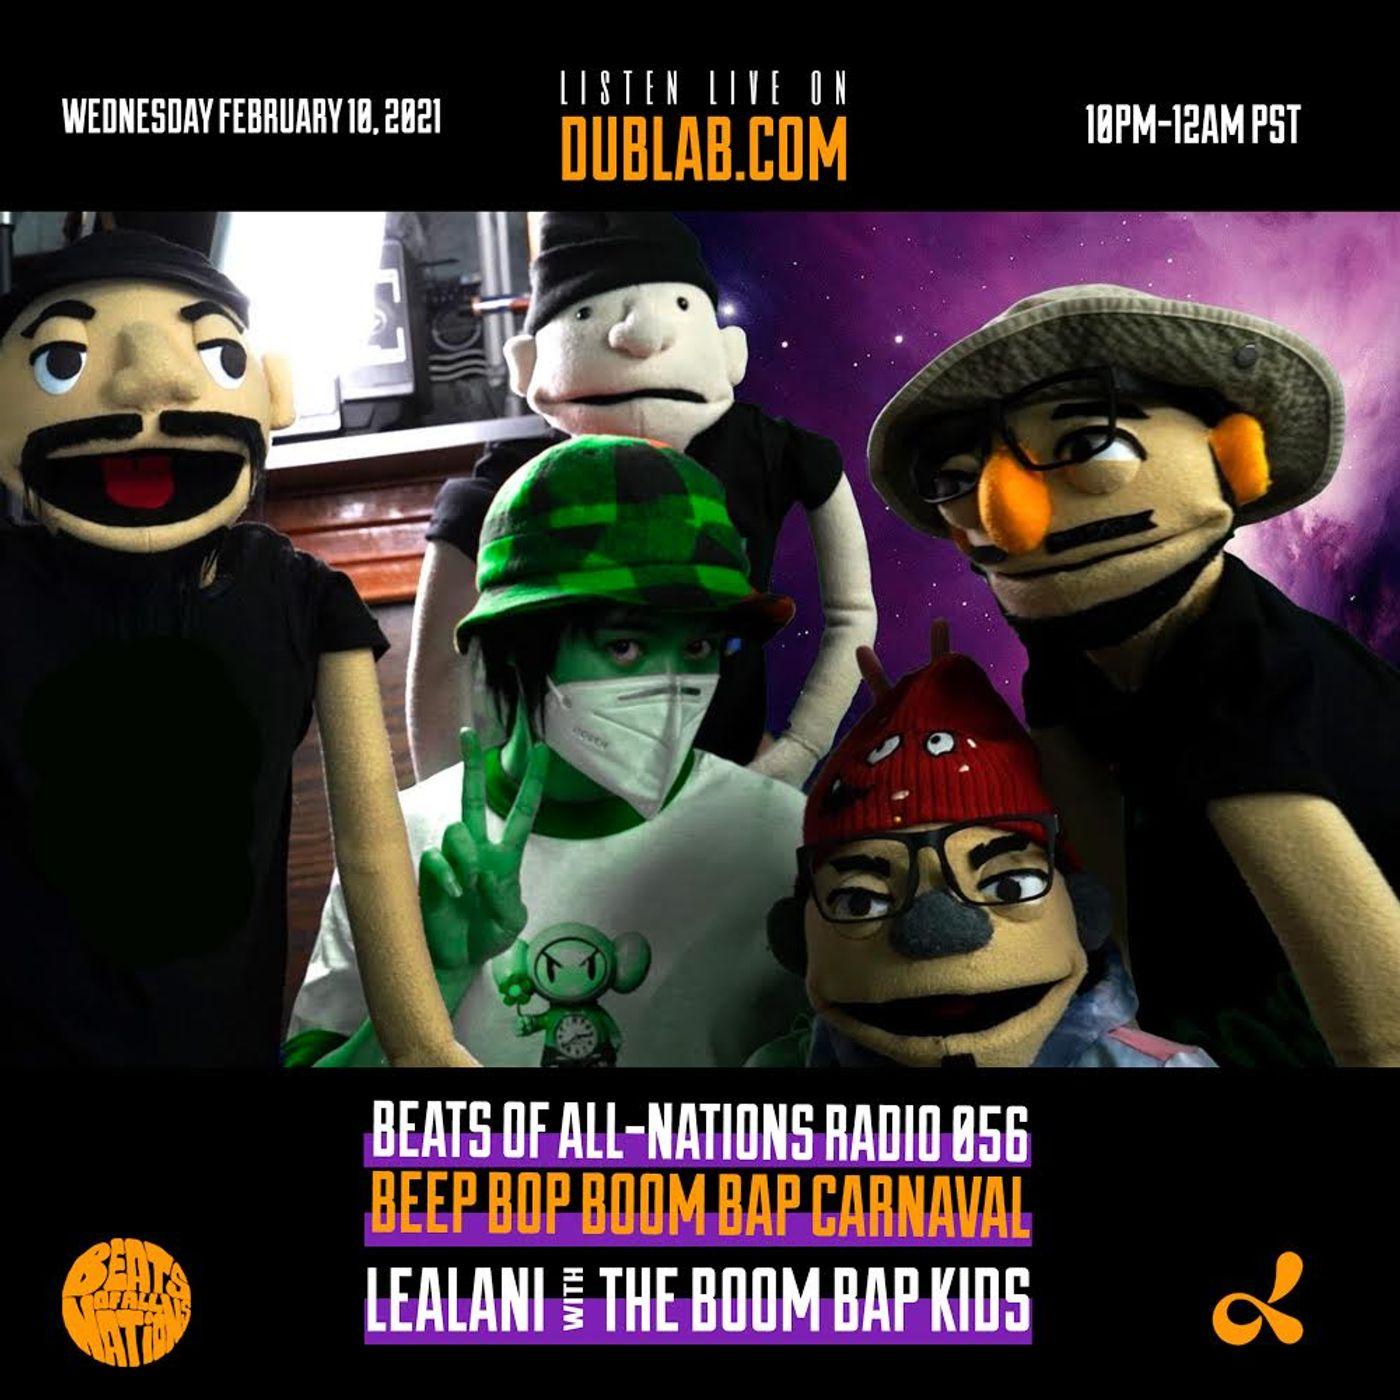 BEEP BOP BOOM BAP CARNAVAL! LEALANI with The Boom Bap Kids | Beats of All-Nations Radio 056